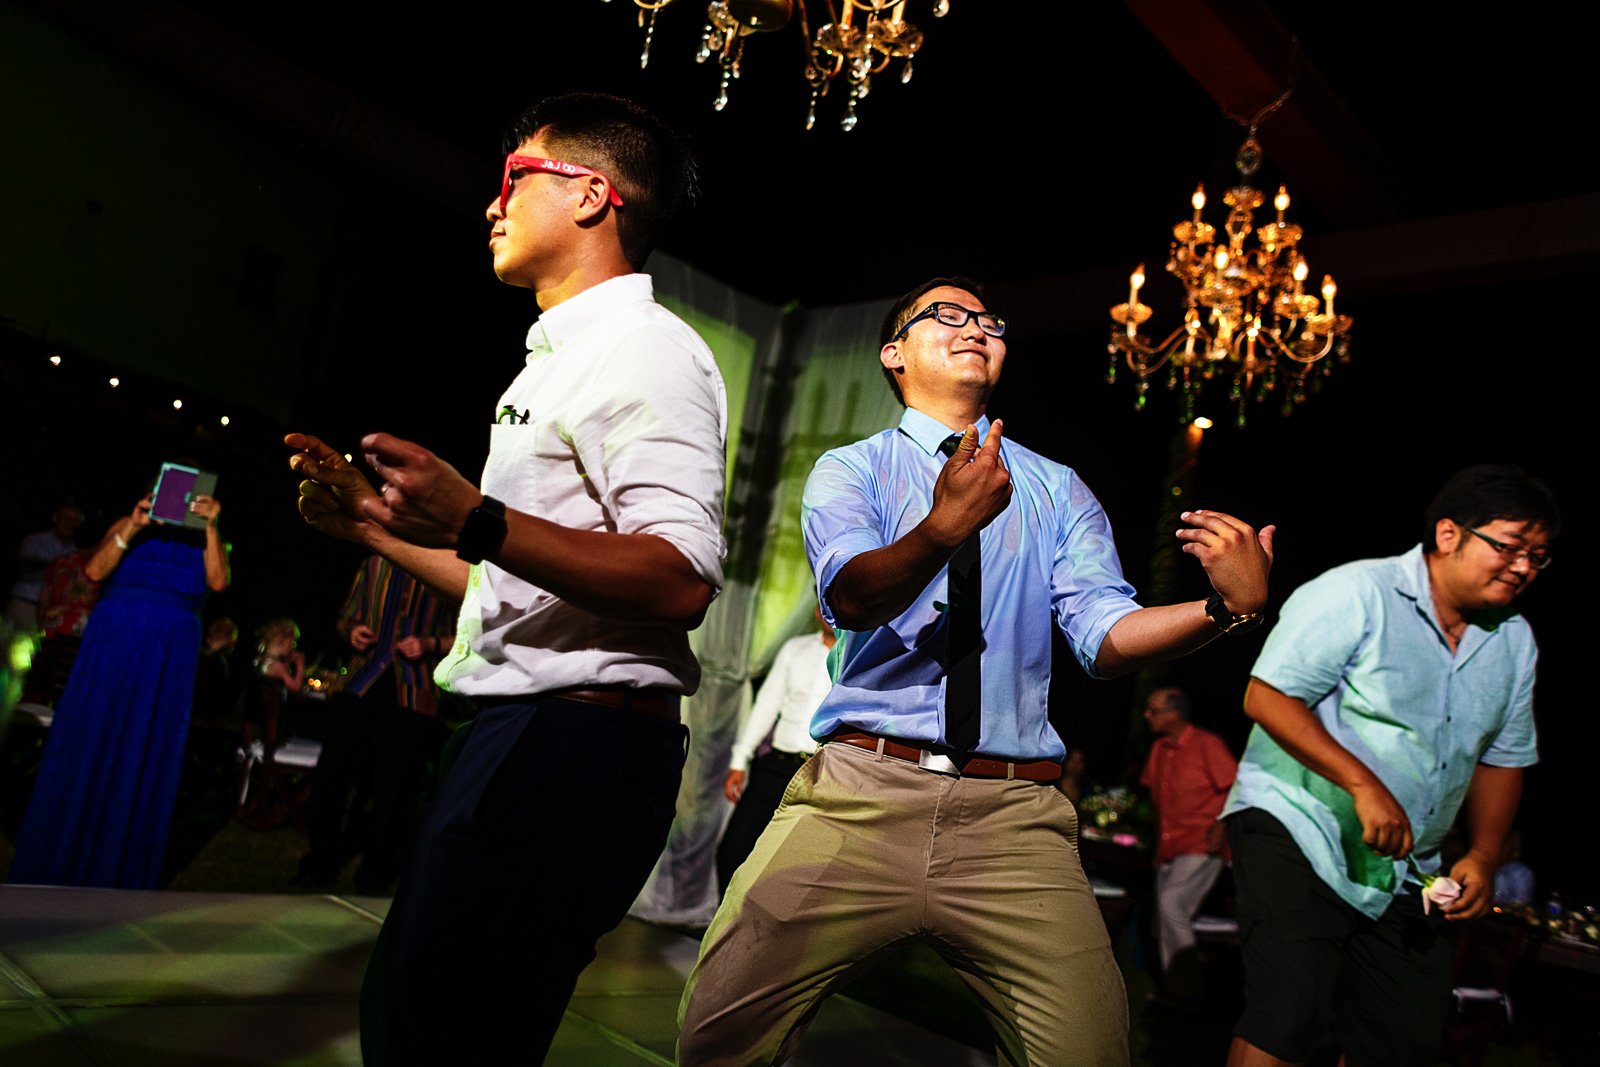 Wedding guests singing, dancing and enjoying the destination wedding reception.